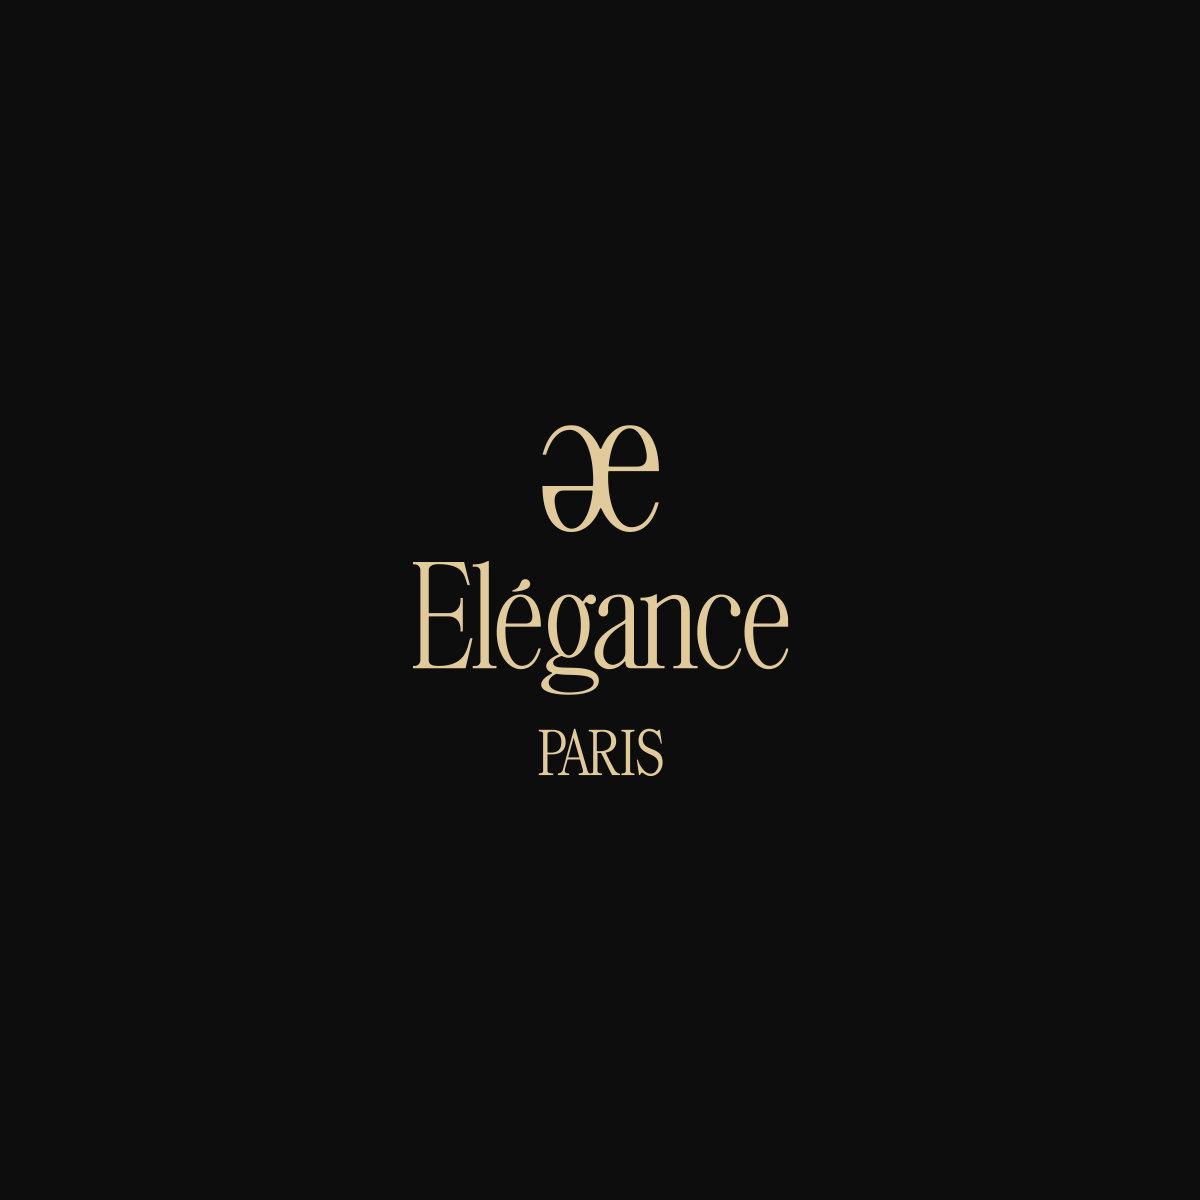 Elegance(エレガンス)好きな方